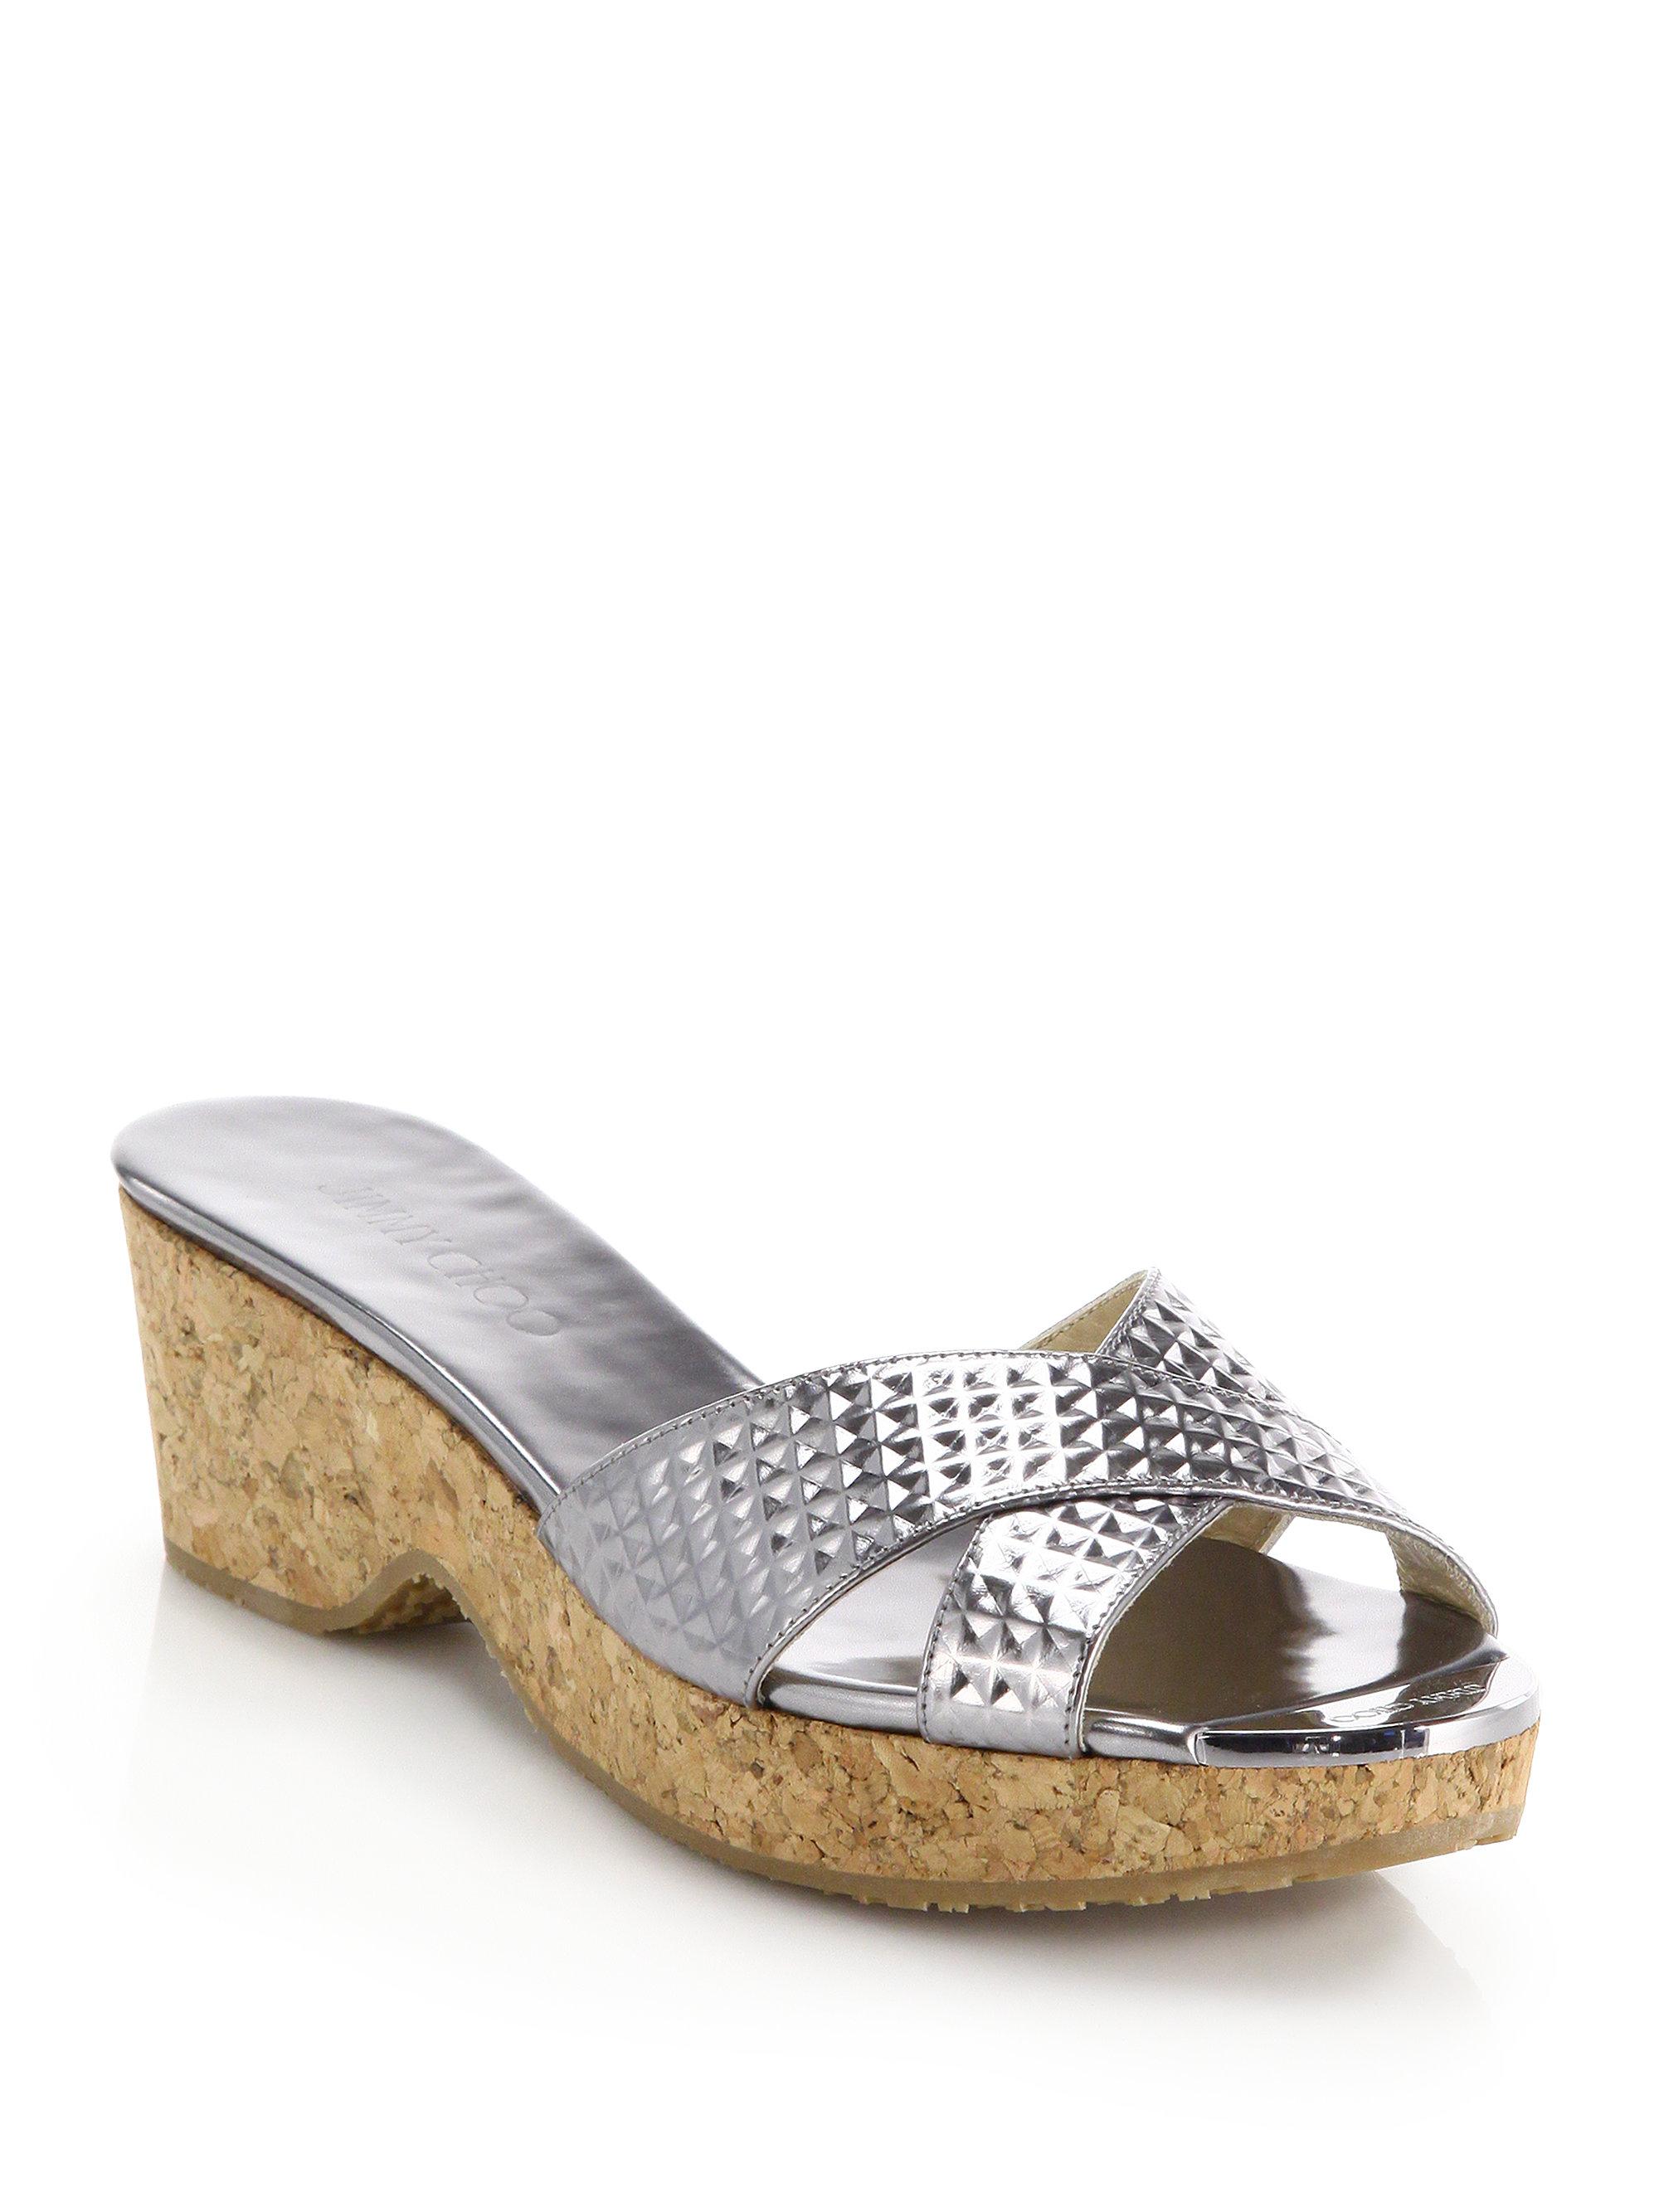 19687df214657 Lyst - Jimmy Choo Panna Textured Metallic Leather   Cork Sandals in ...